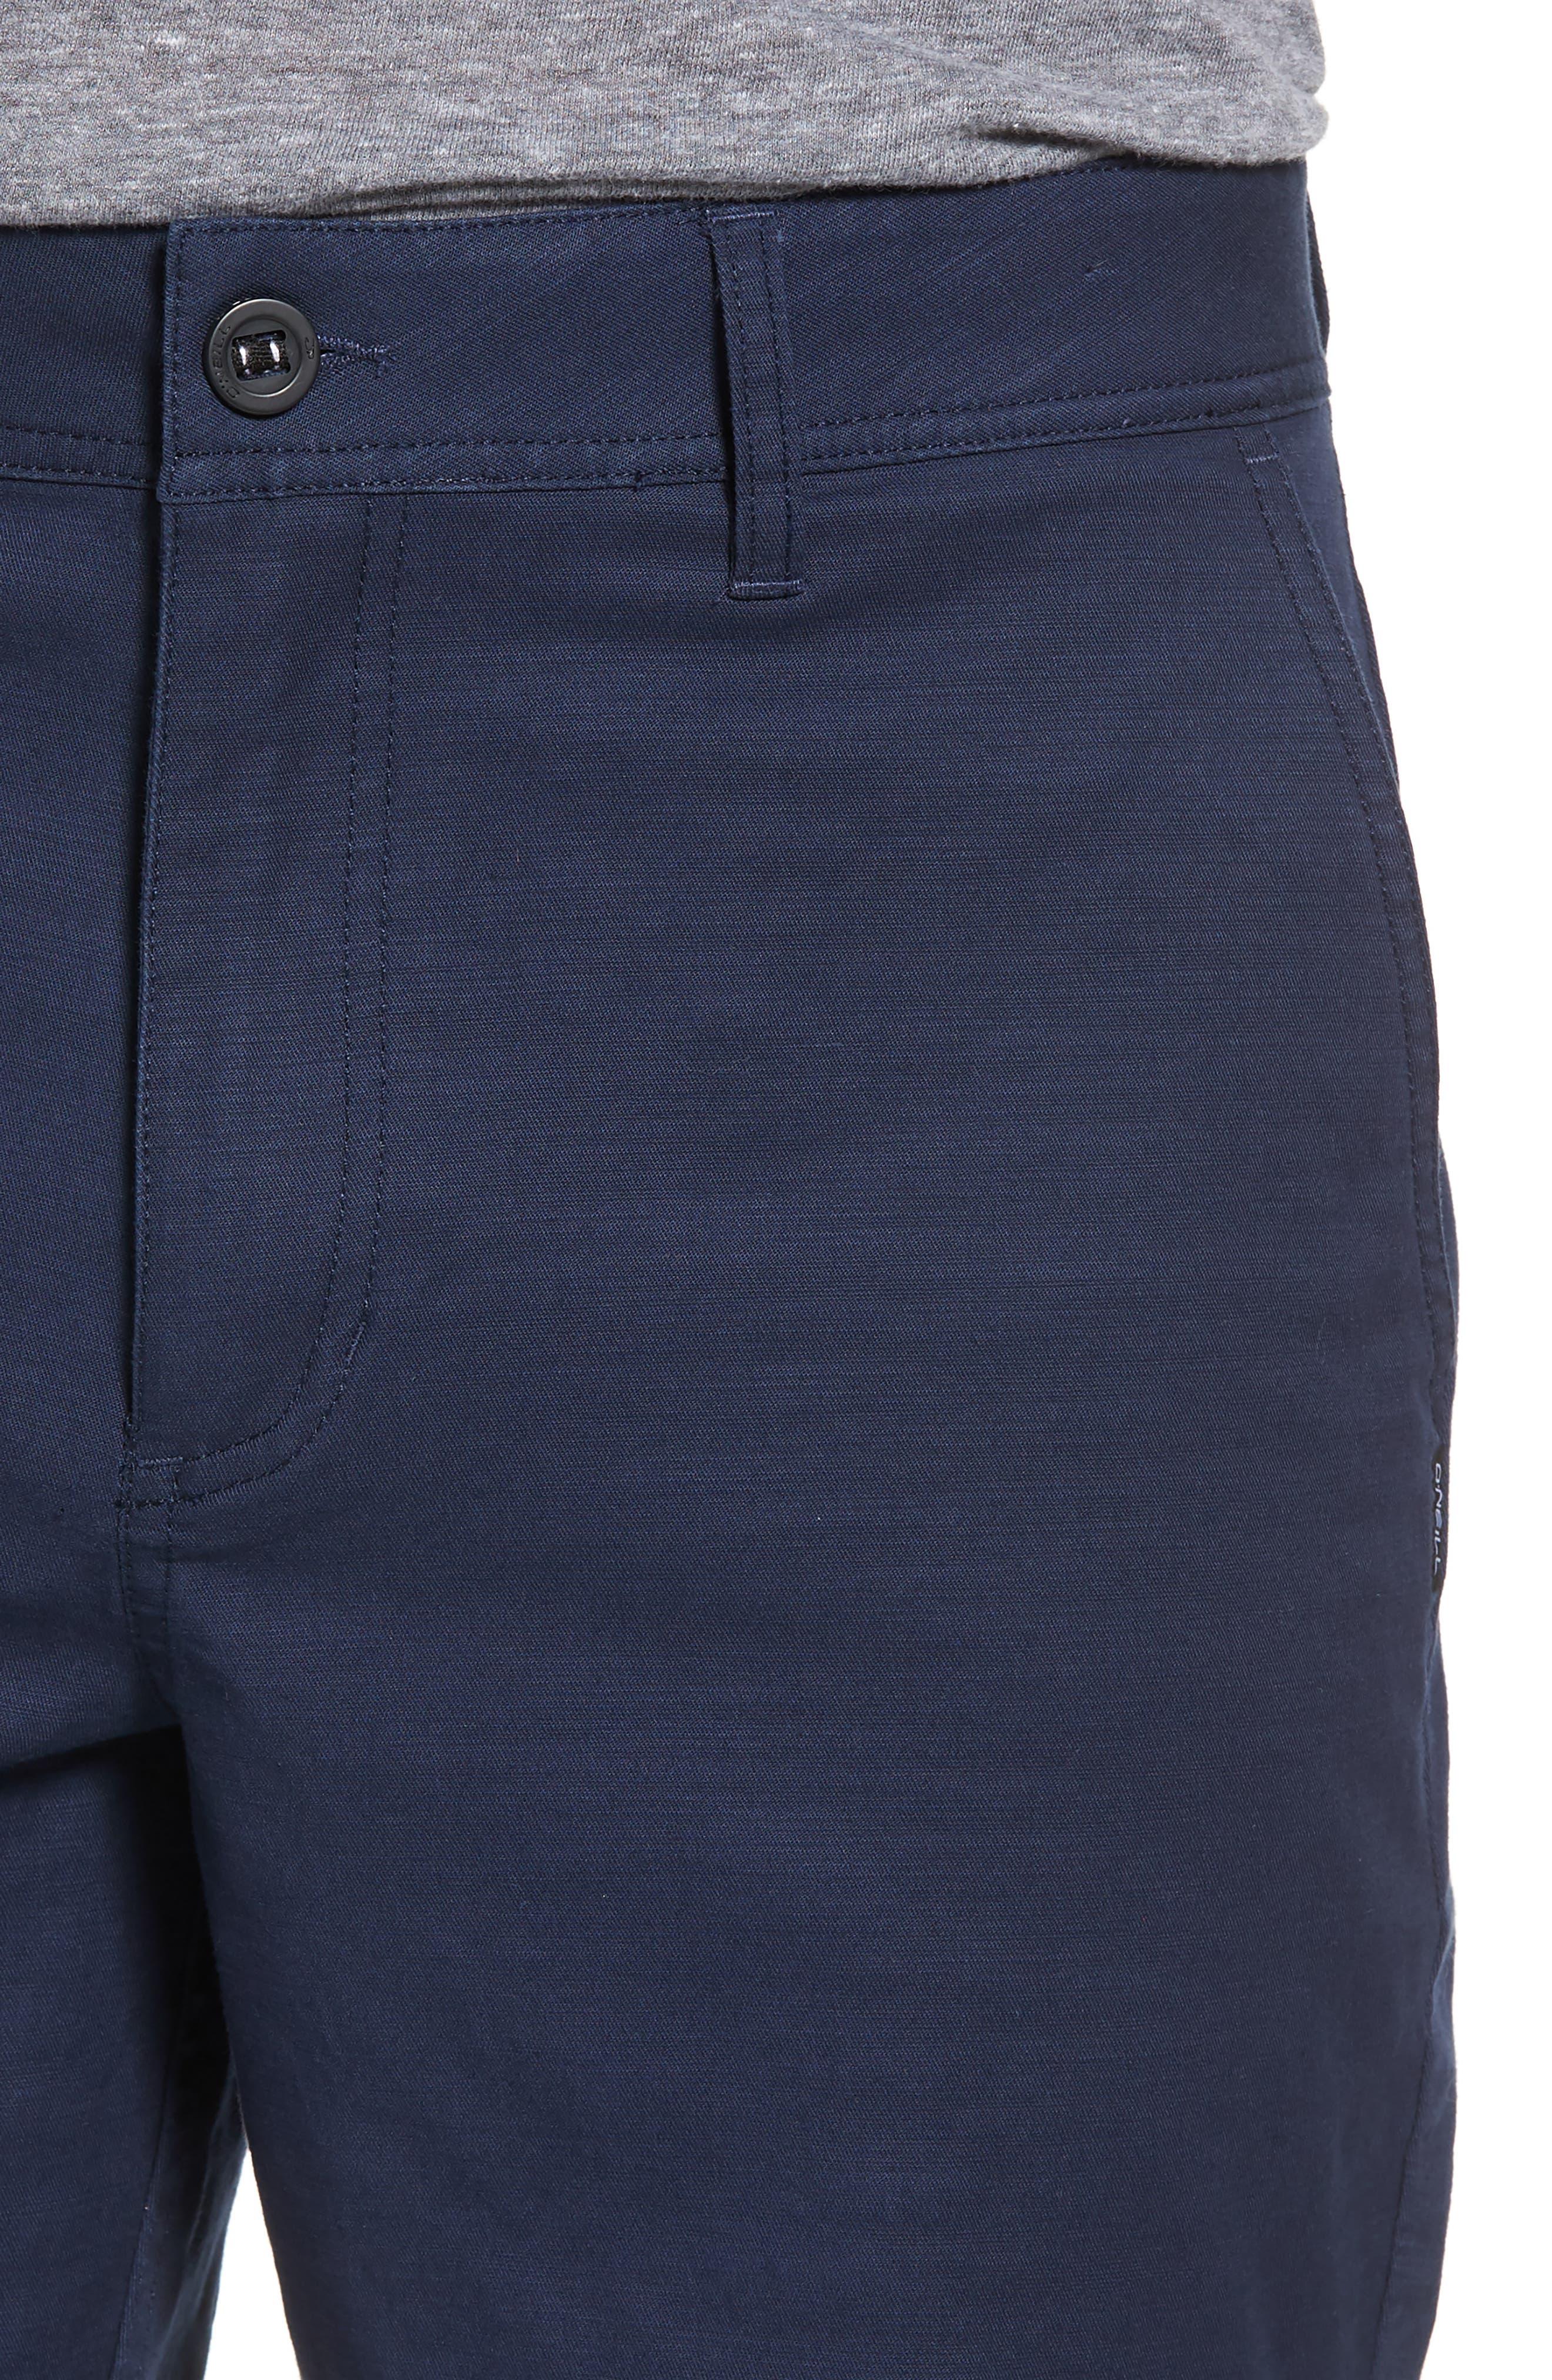 Jay Stretch Chino Shorts,                             Alternate thumbnail 20, color,